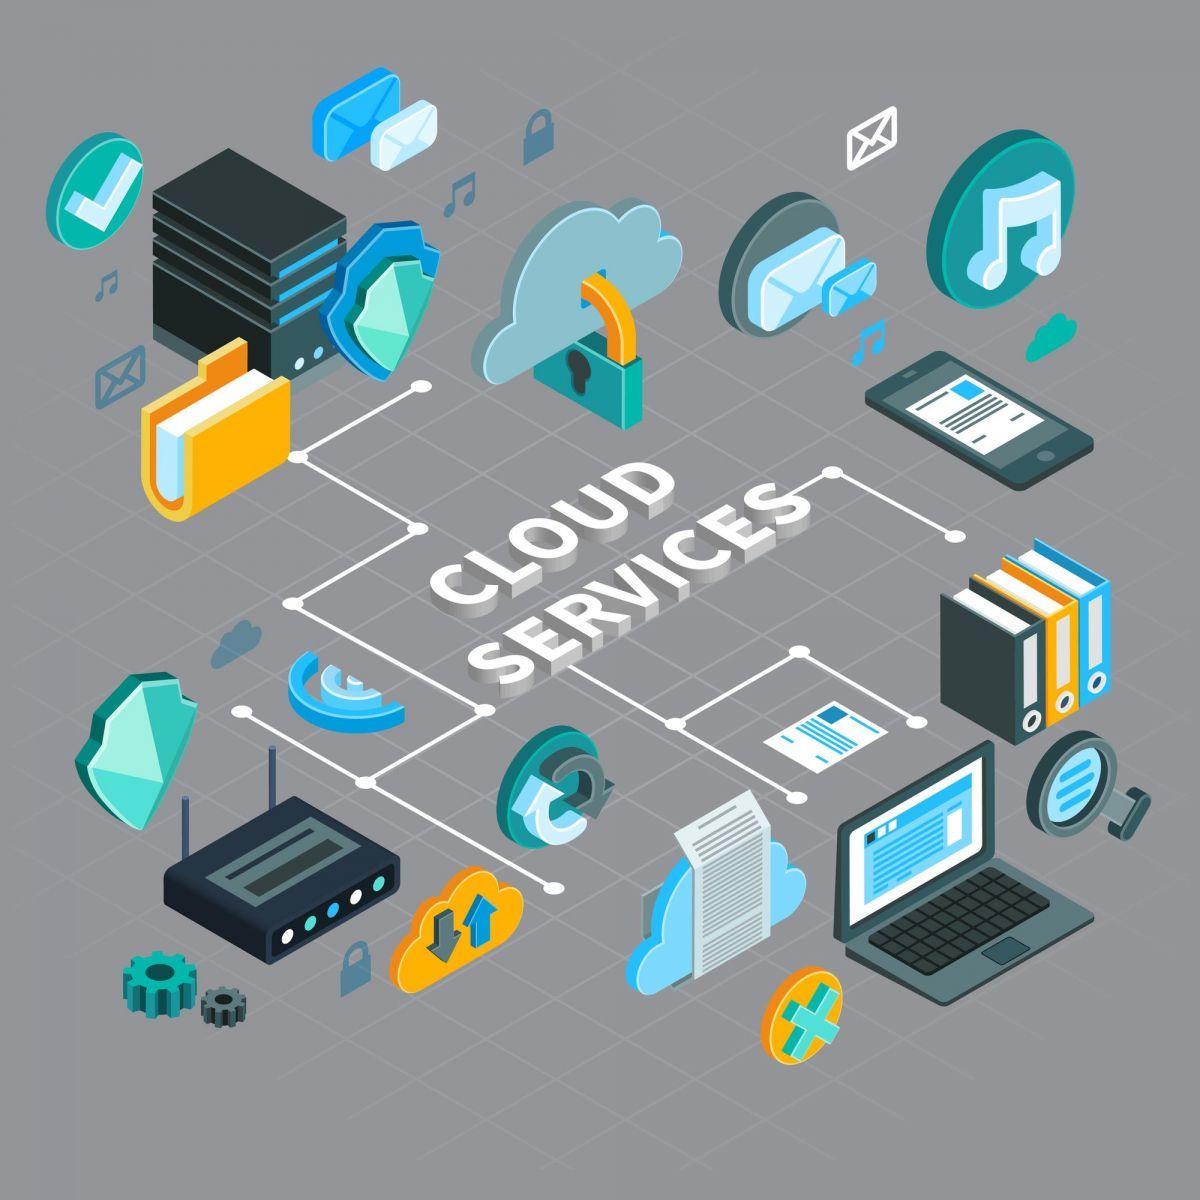 imagem explicativa sobre cloud service